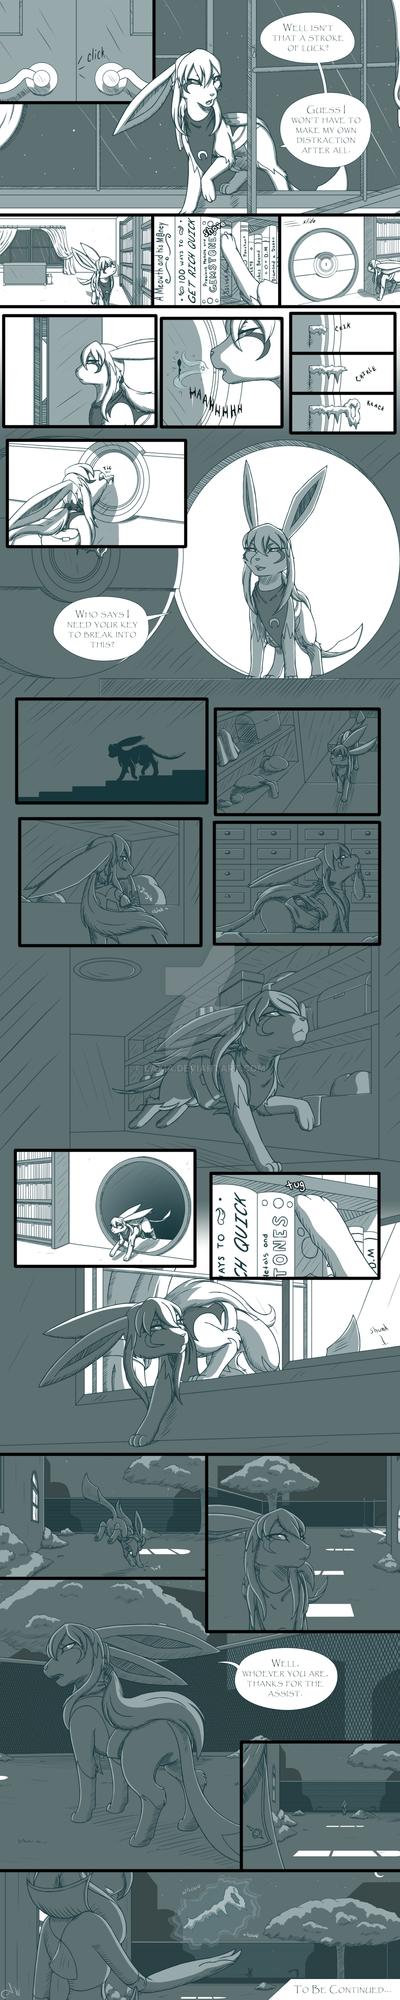 Robinhooding Page 4 by Laxia